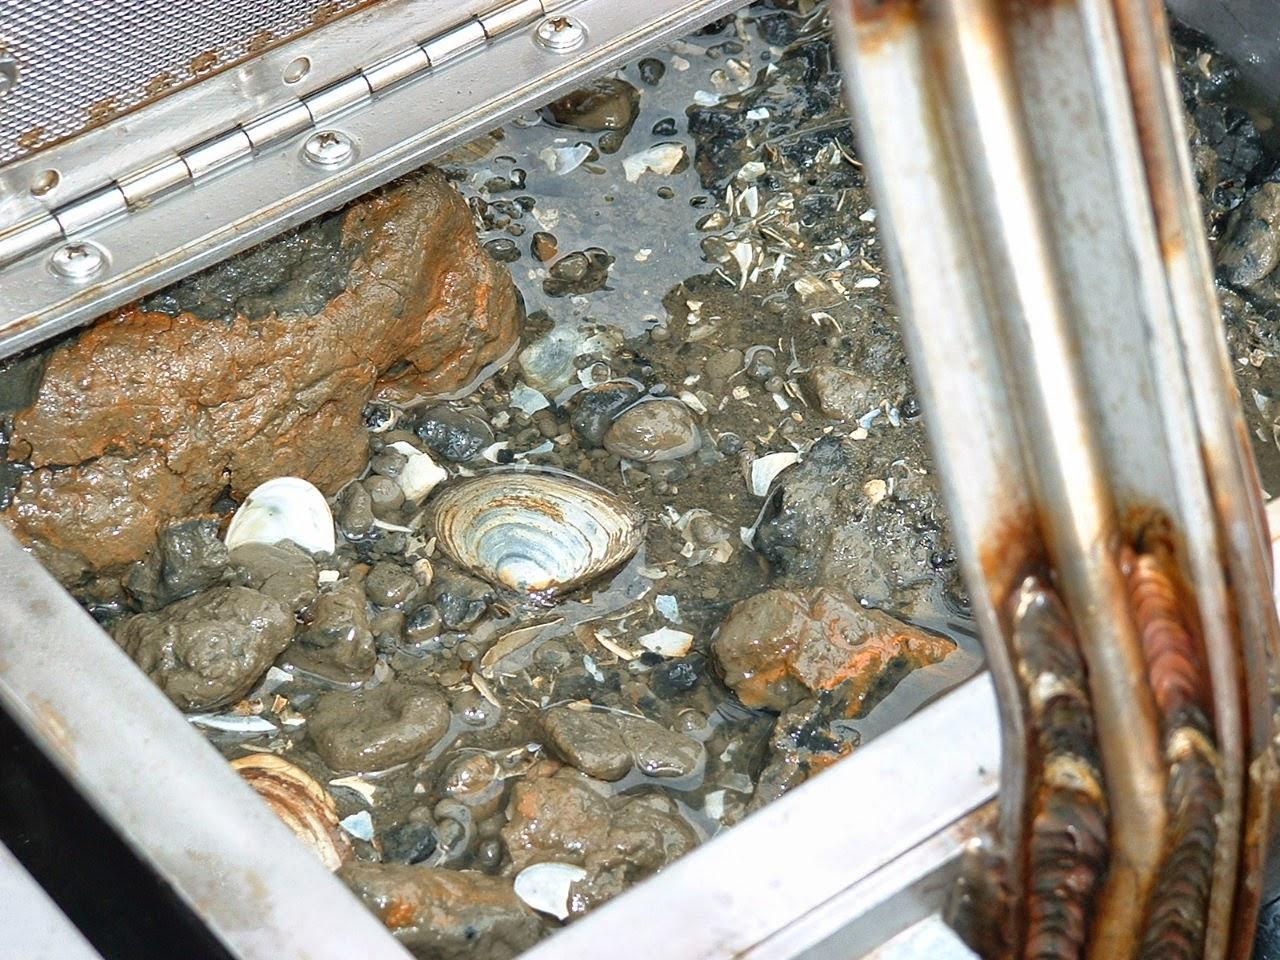 Washington Department Of Ecology April 2014 S320 Fuel Filter Puget Sound Sediment Sample